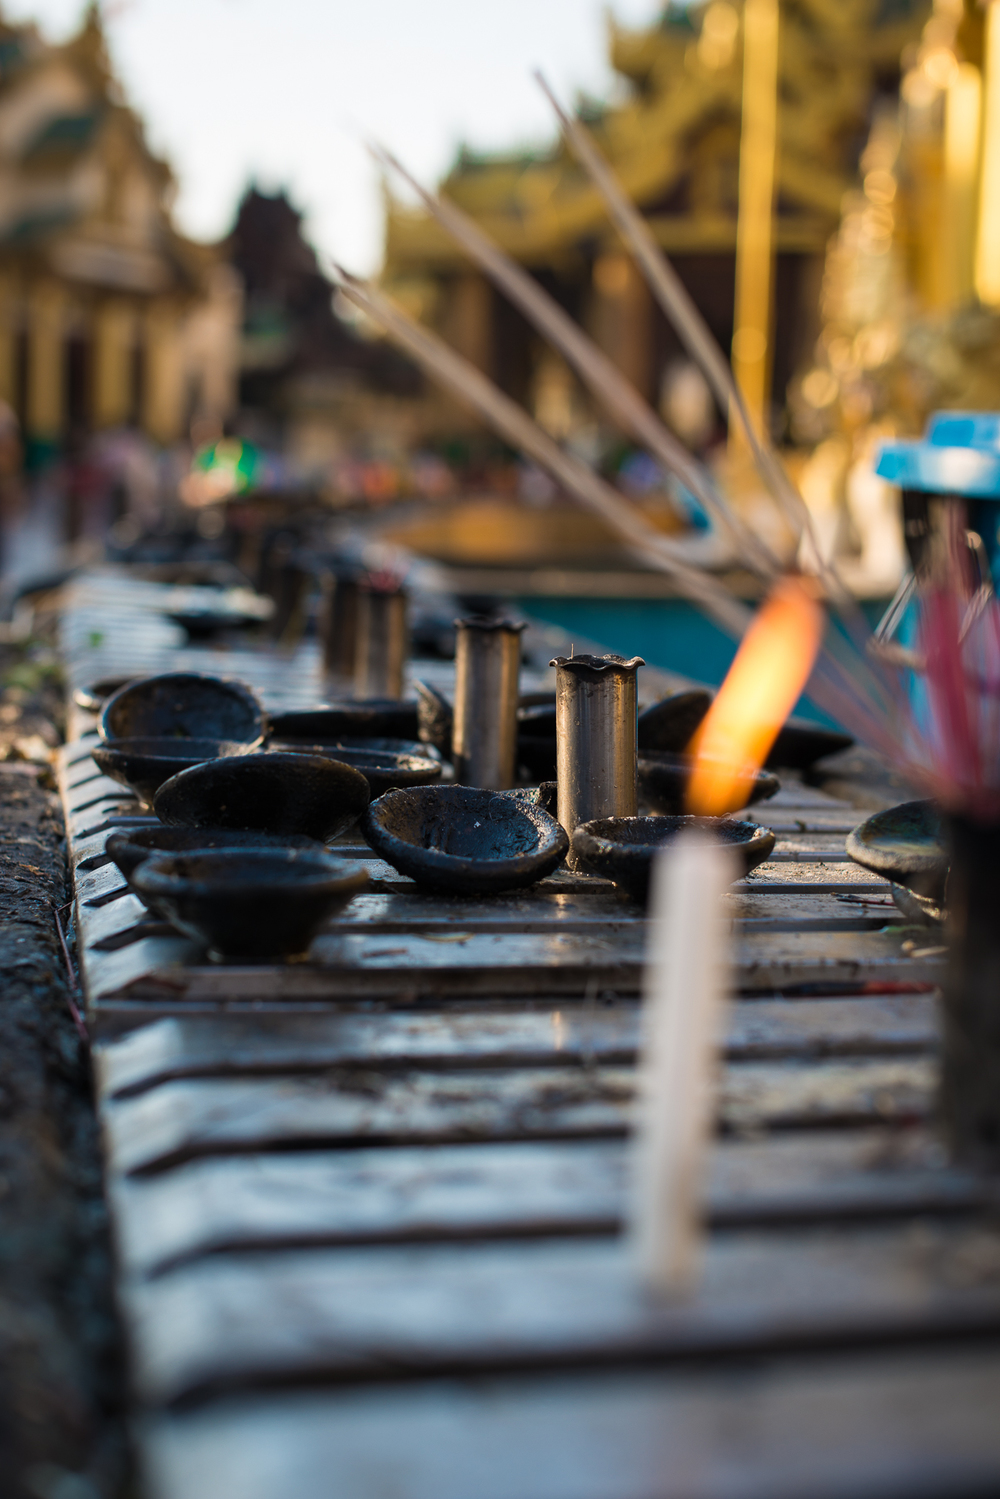 Candles, incense and oil lamps at Shwedagon Pagoda. Yangon, Myanmar